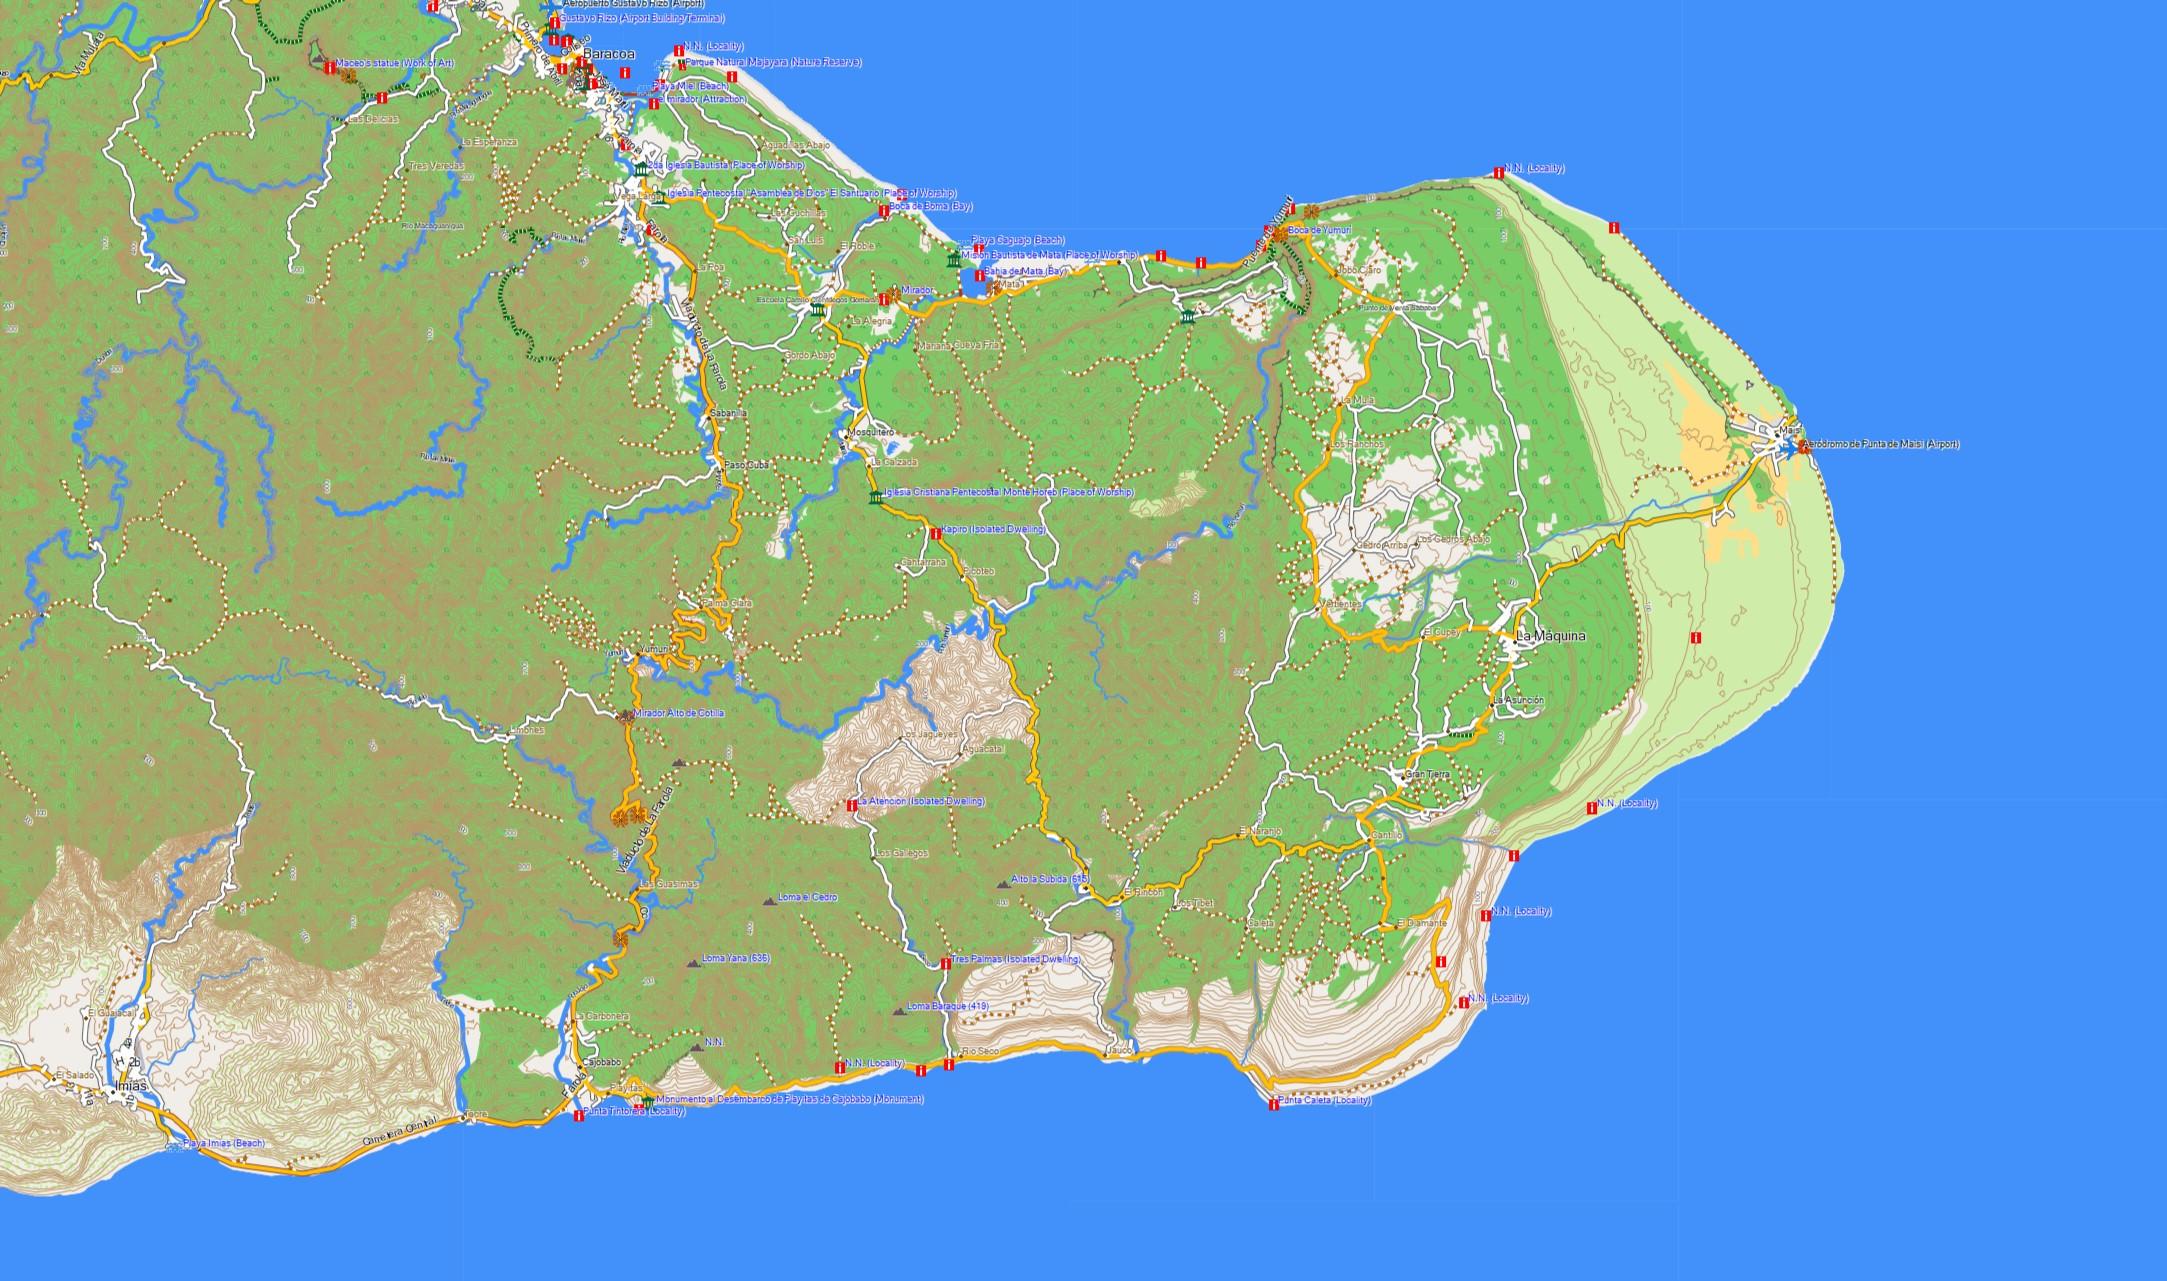 Flughafen D303274sseldorf Karte.Cuba Karte